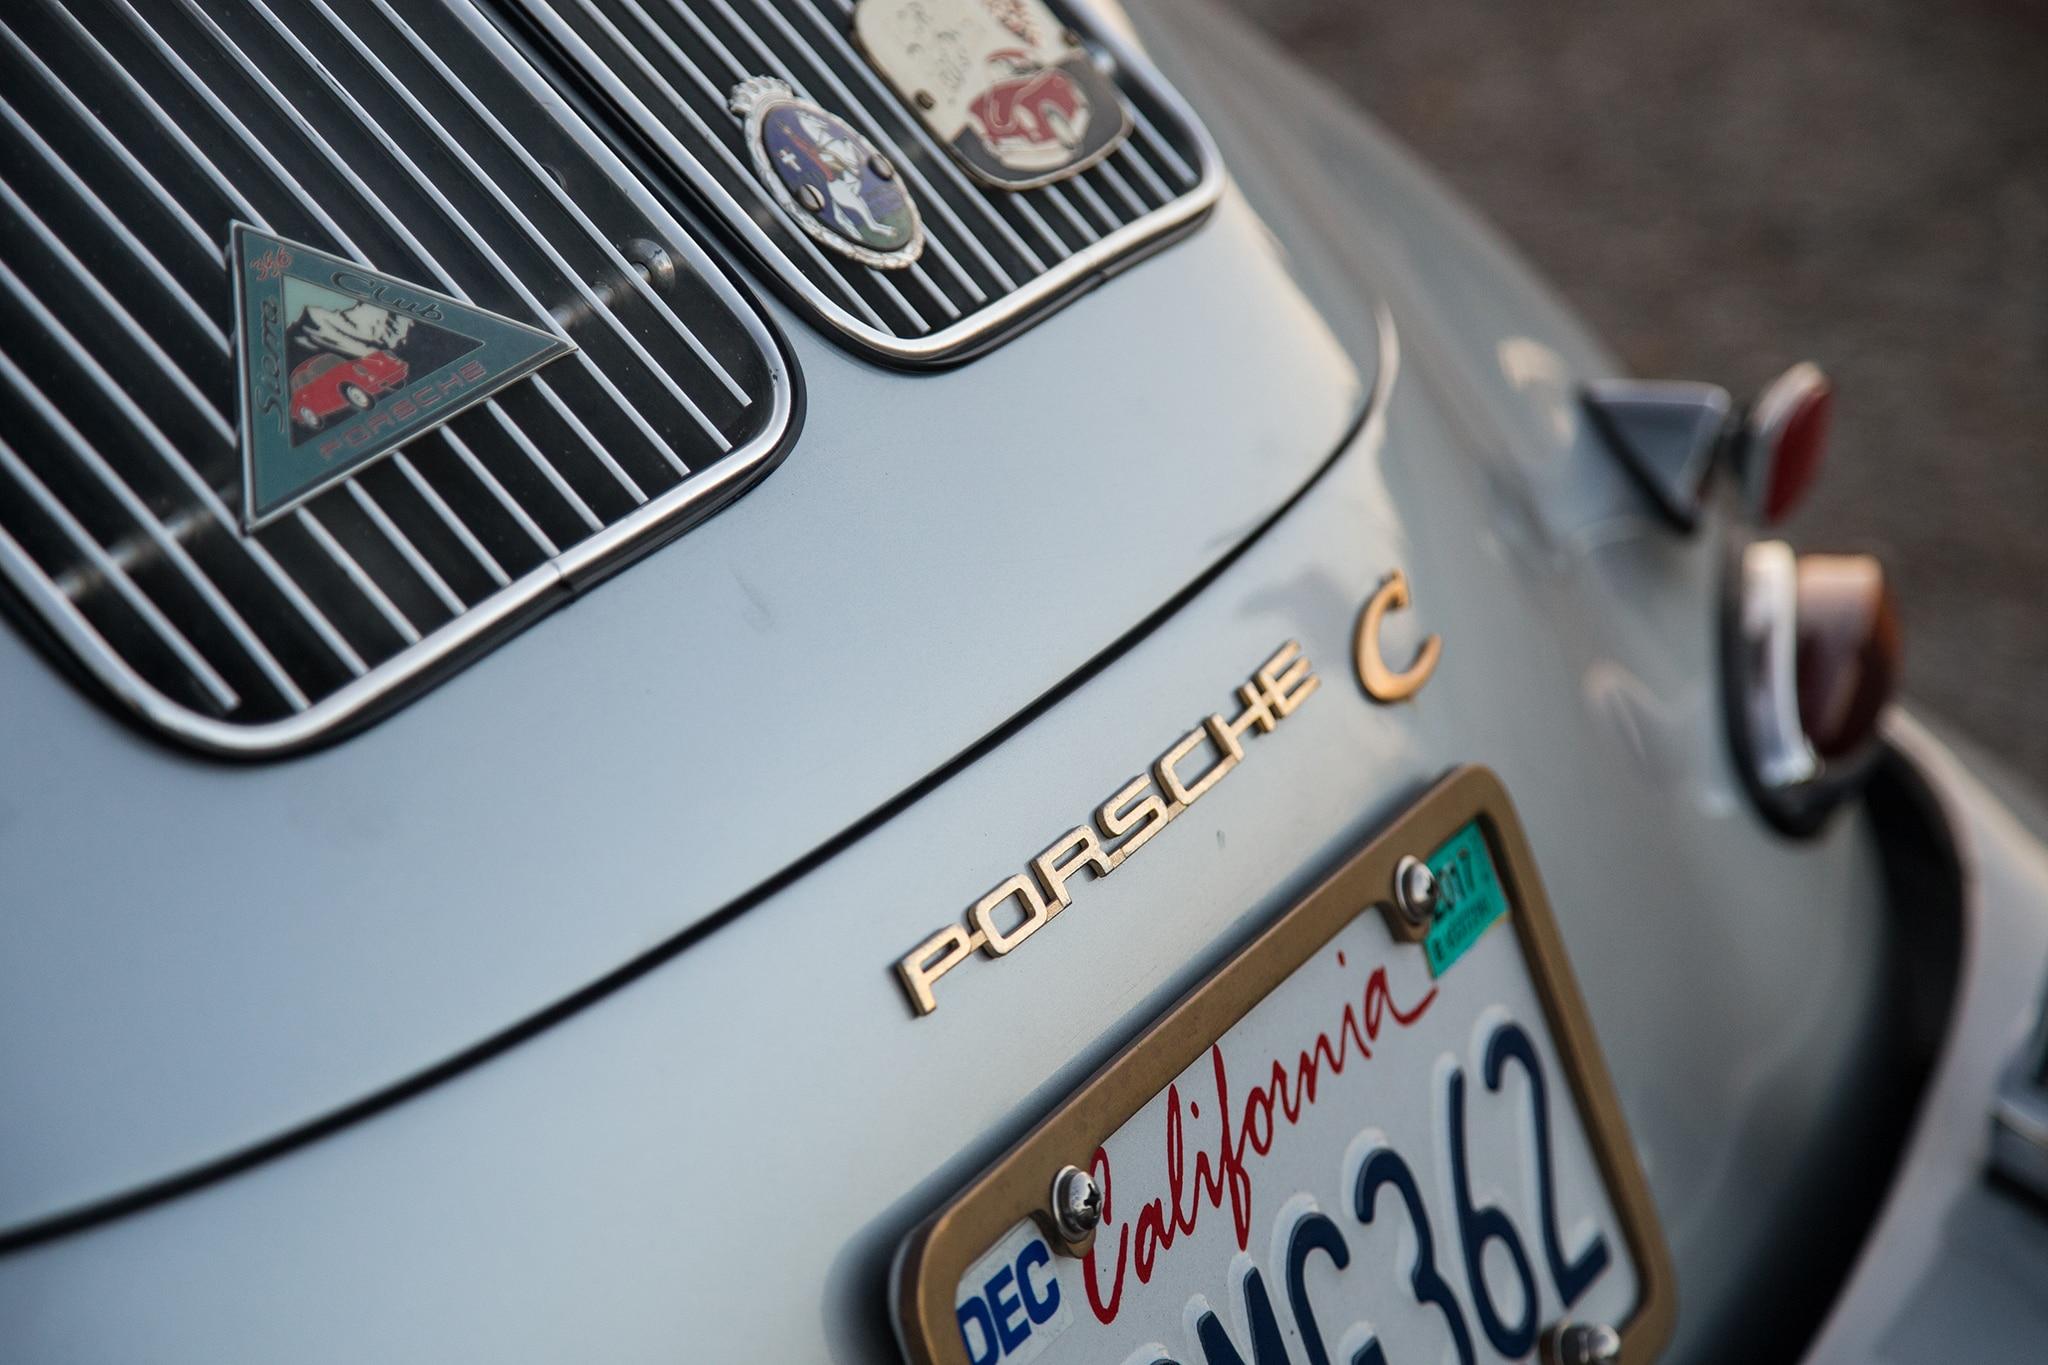 1964 Porsche 356 C Badge